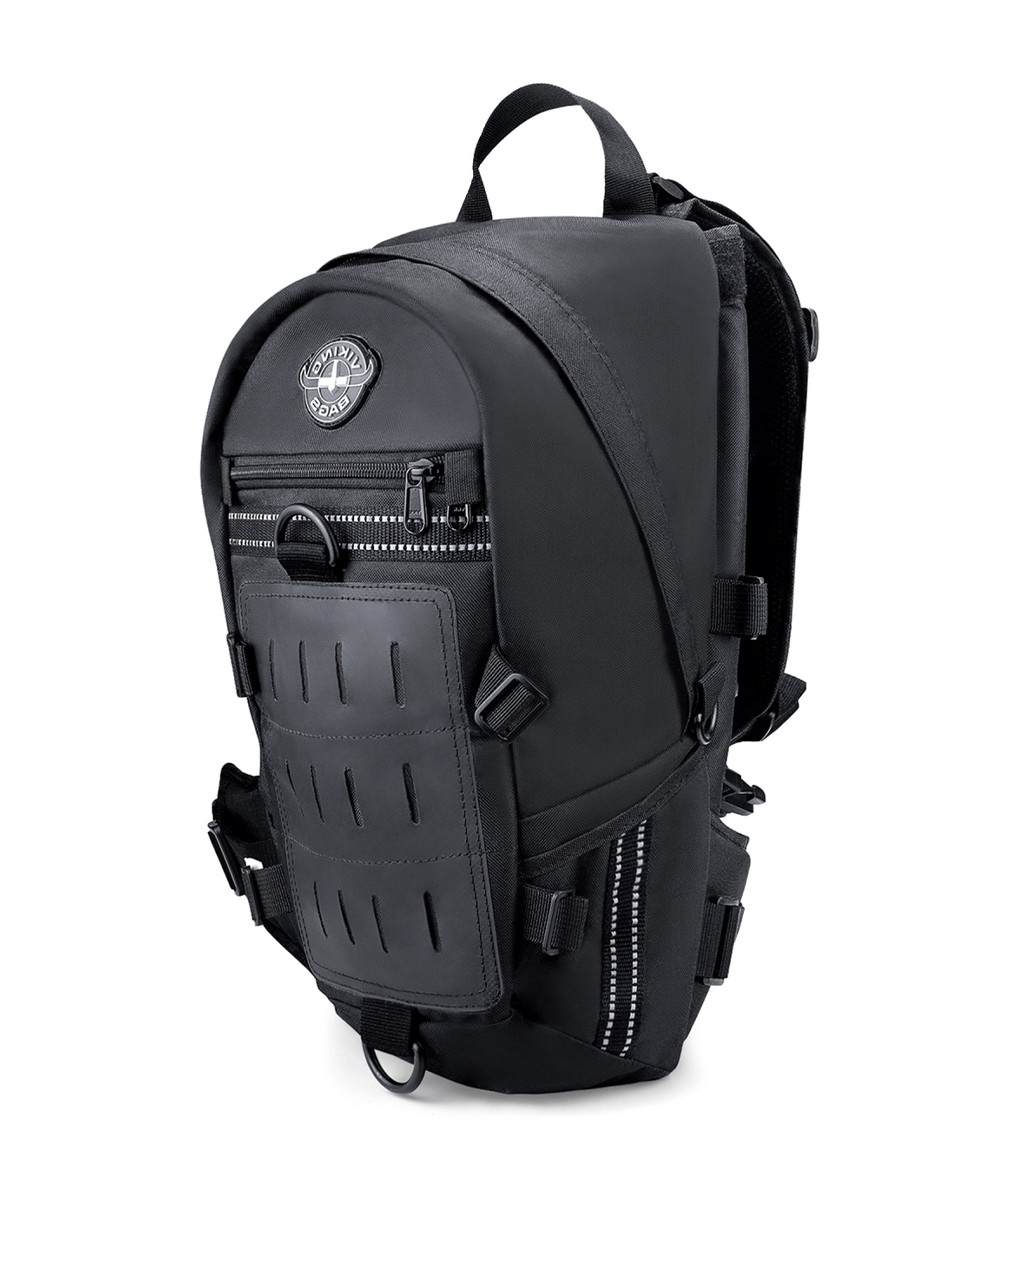 VikingBags Dirtman Medium Black Motorcycle Backpack Main View